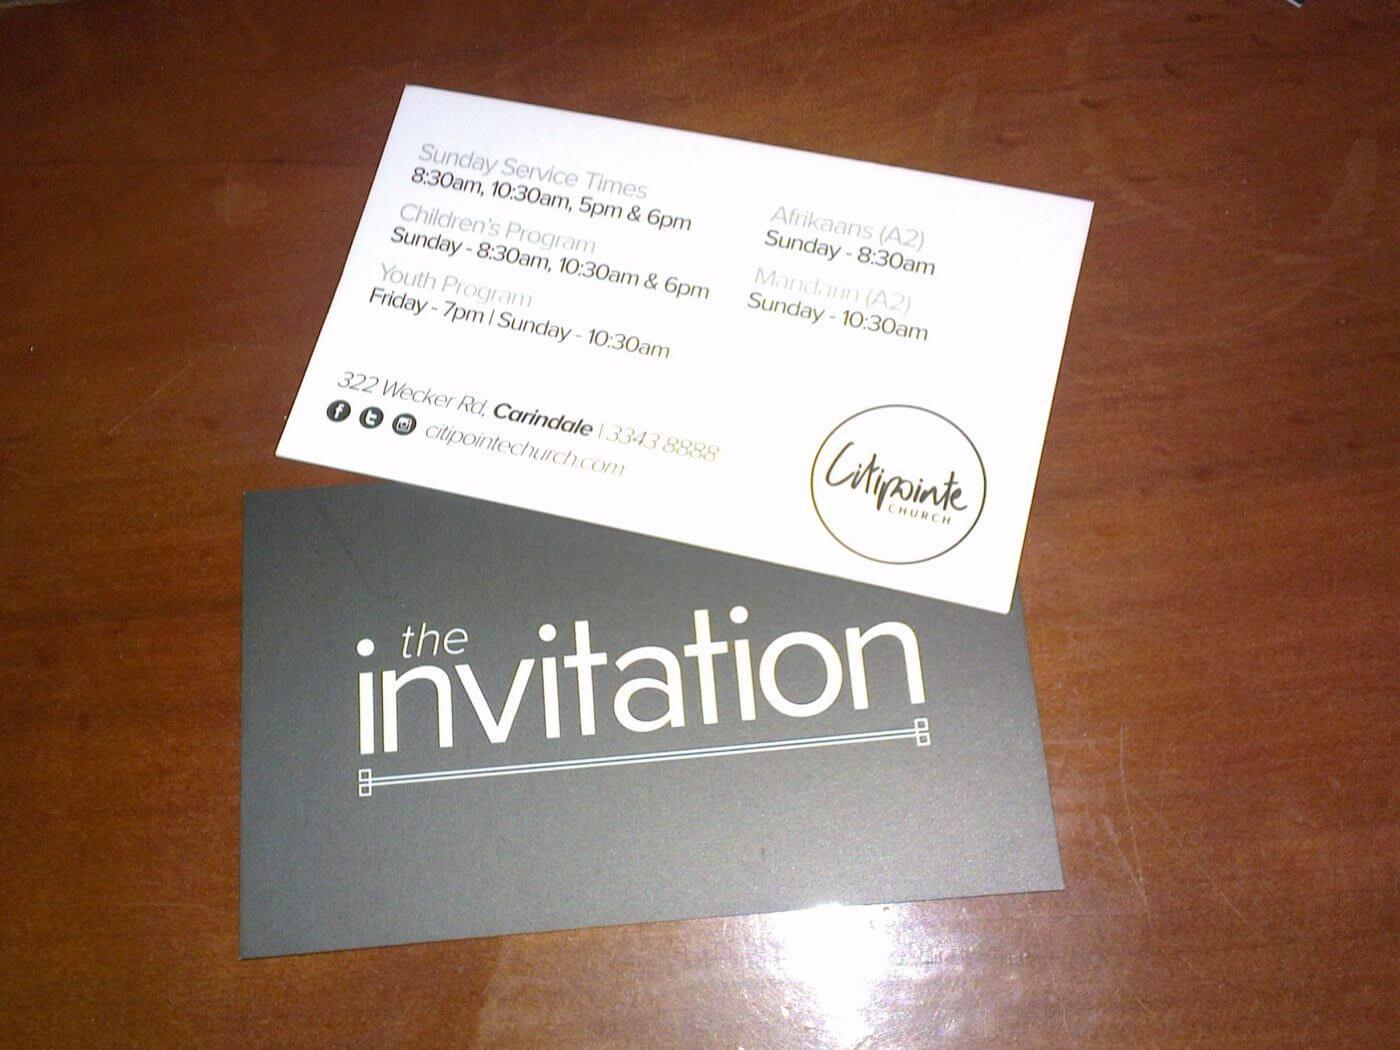 Church Invite Cards Template - Atlantaauctionco com